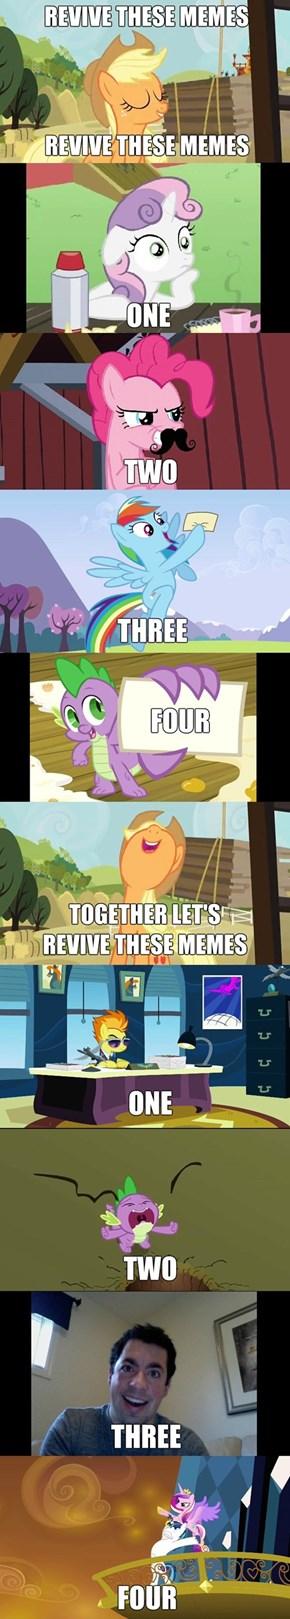 Every. Last. Meme.